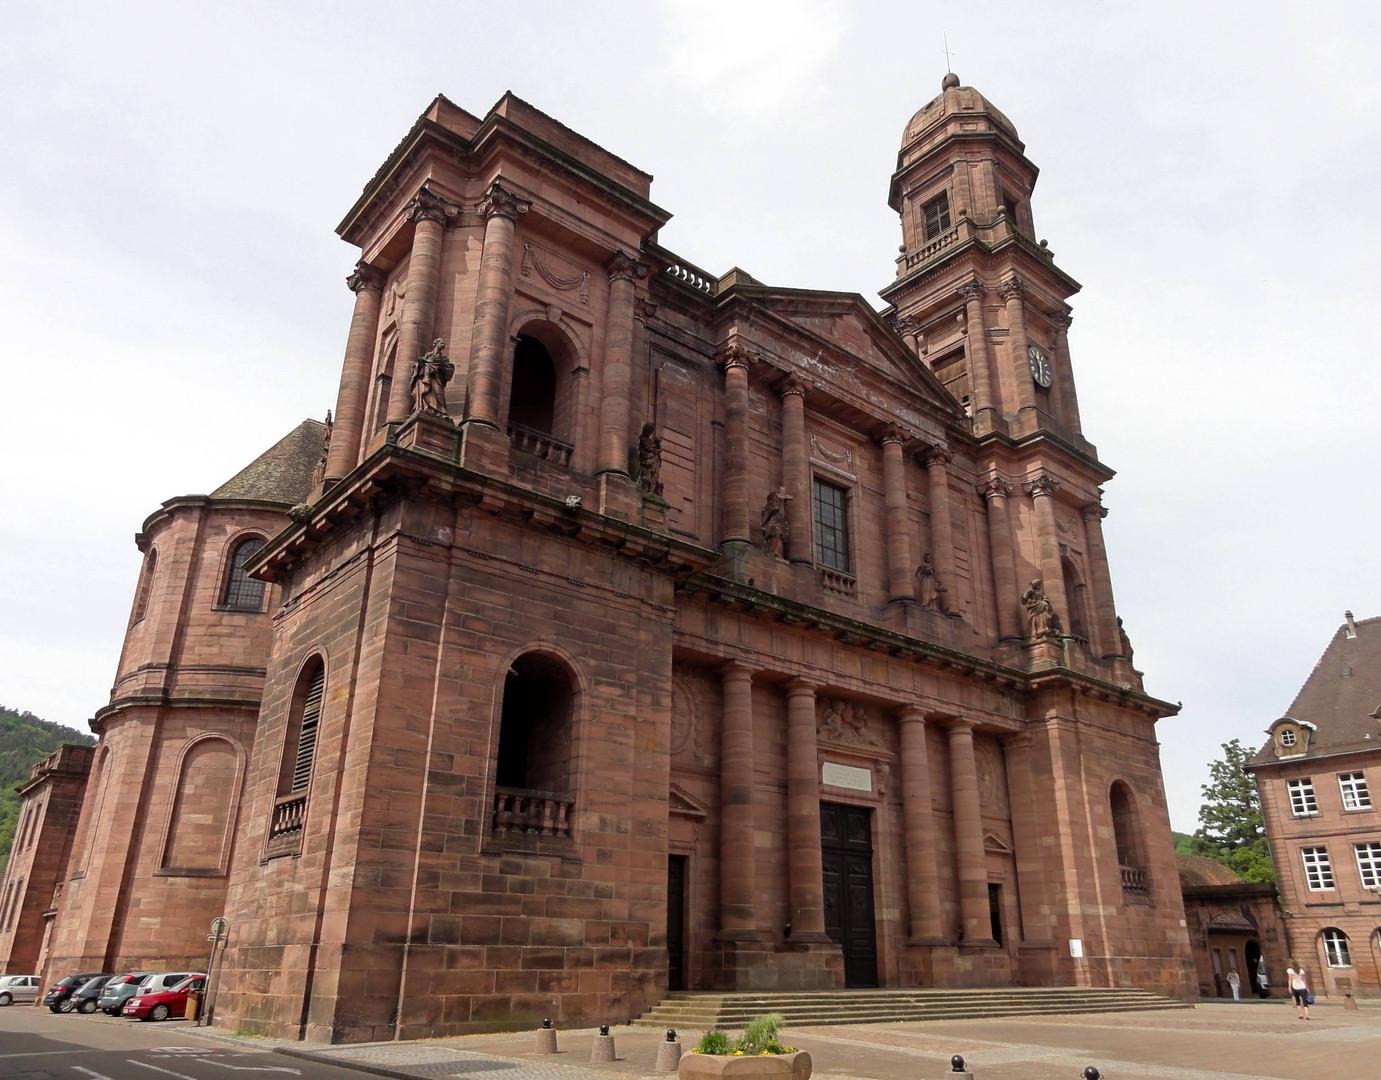 Eglise Notre Dame (Guewiller)